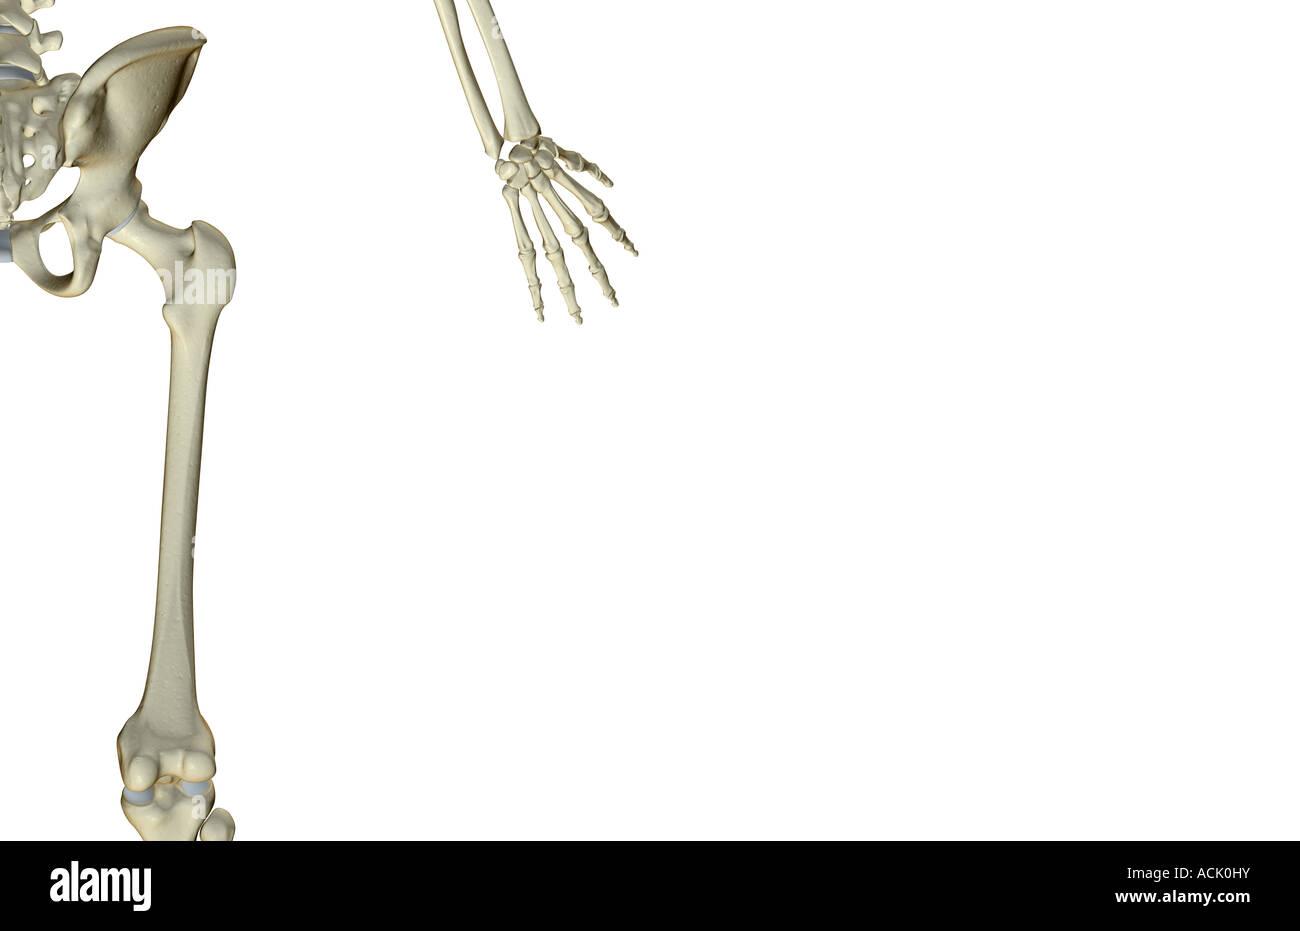 Bones Of The Hip Stockfotos & Bones Of The Hip Bilder - Alamy